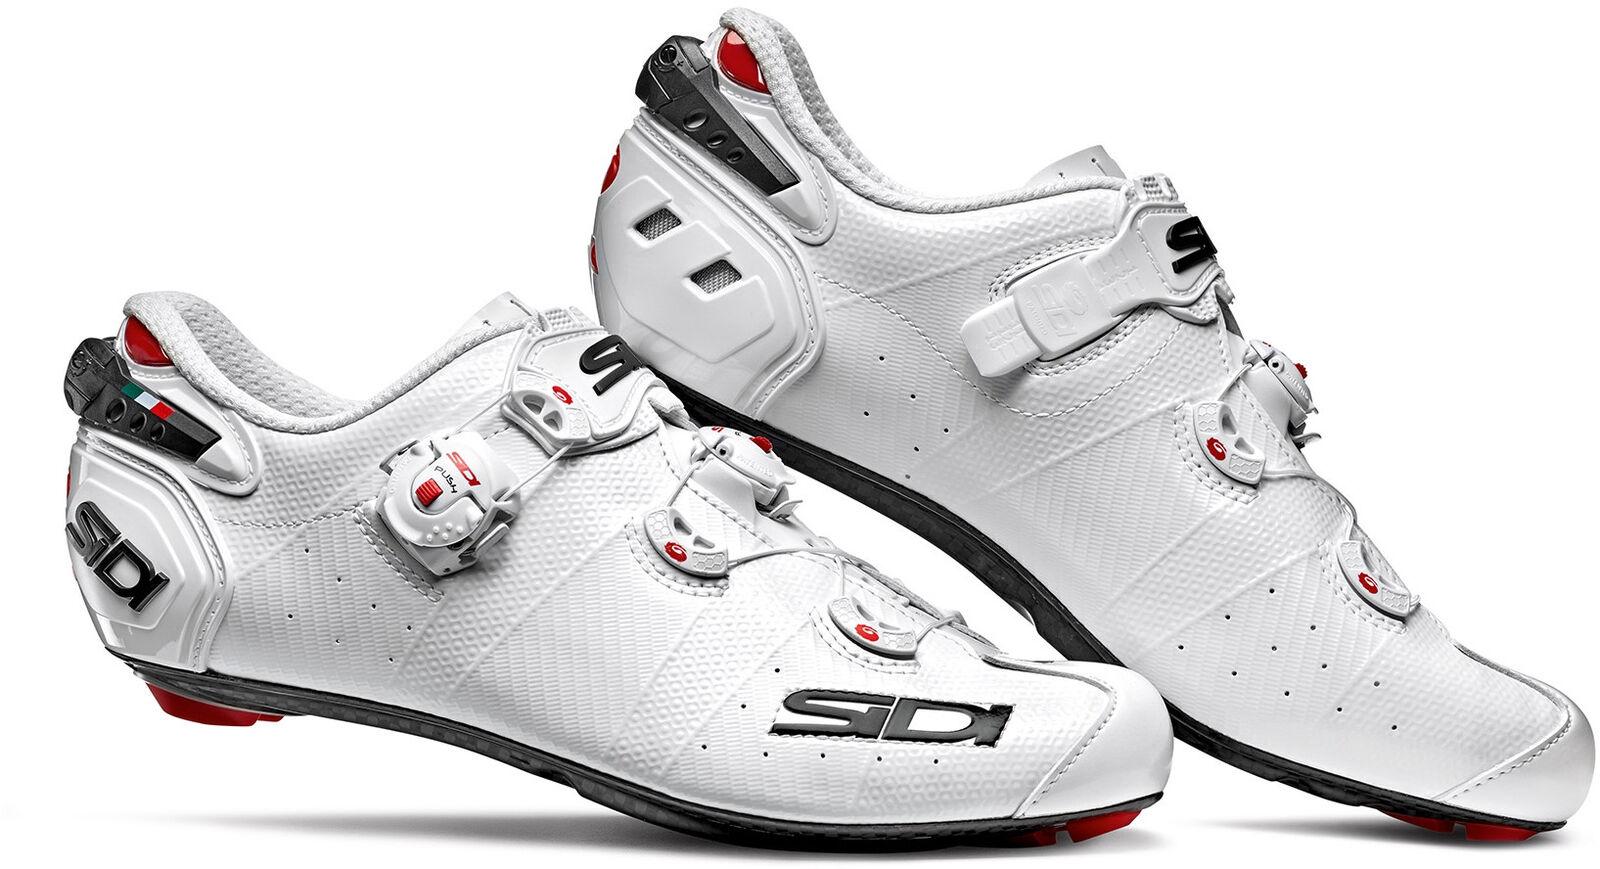 Sidi Wire 2 Carbon  Road Bike shoes White  discount sales